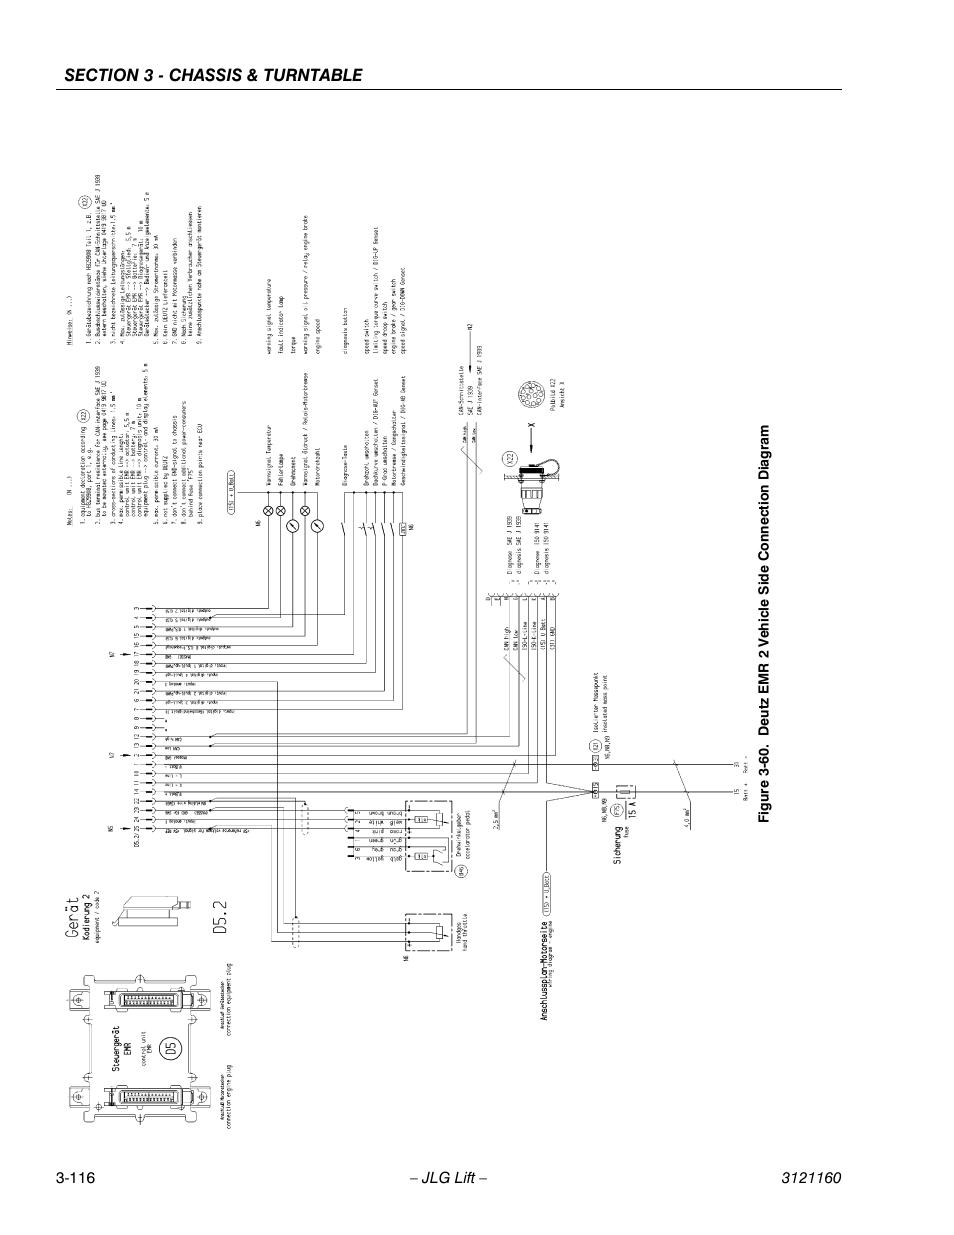 [GA_0851] 1983 Deutz Alternator Wiring Diagram